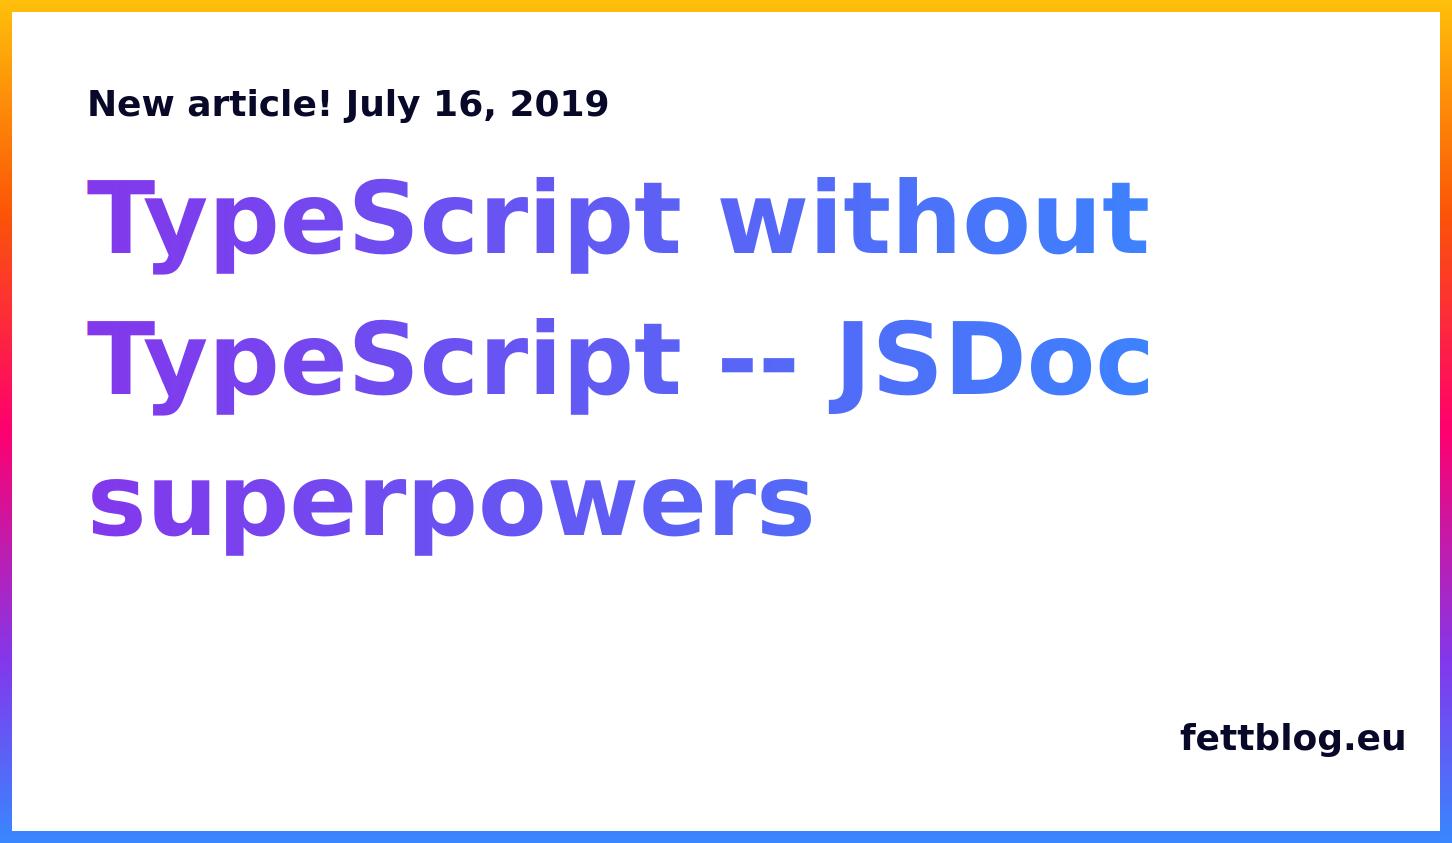 Typescript jsdoc superpowers